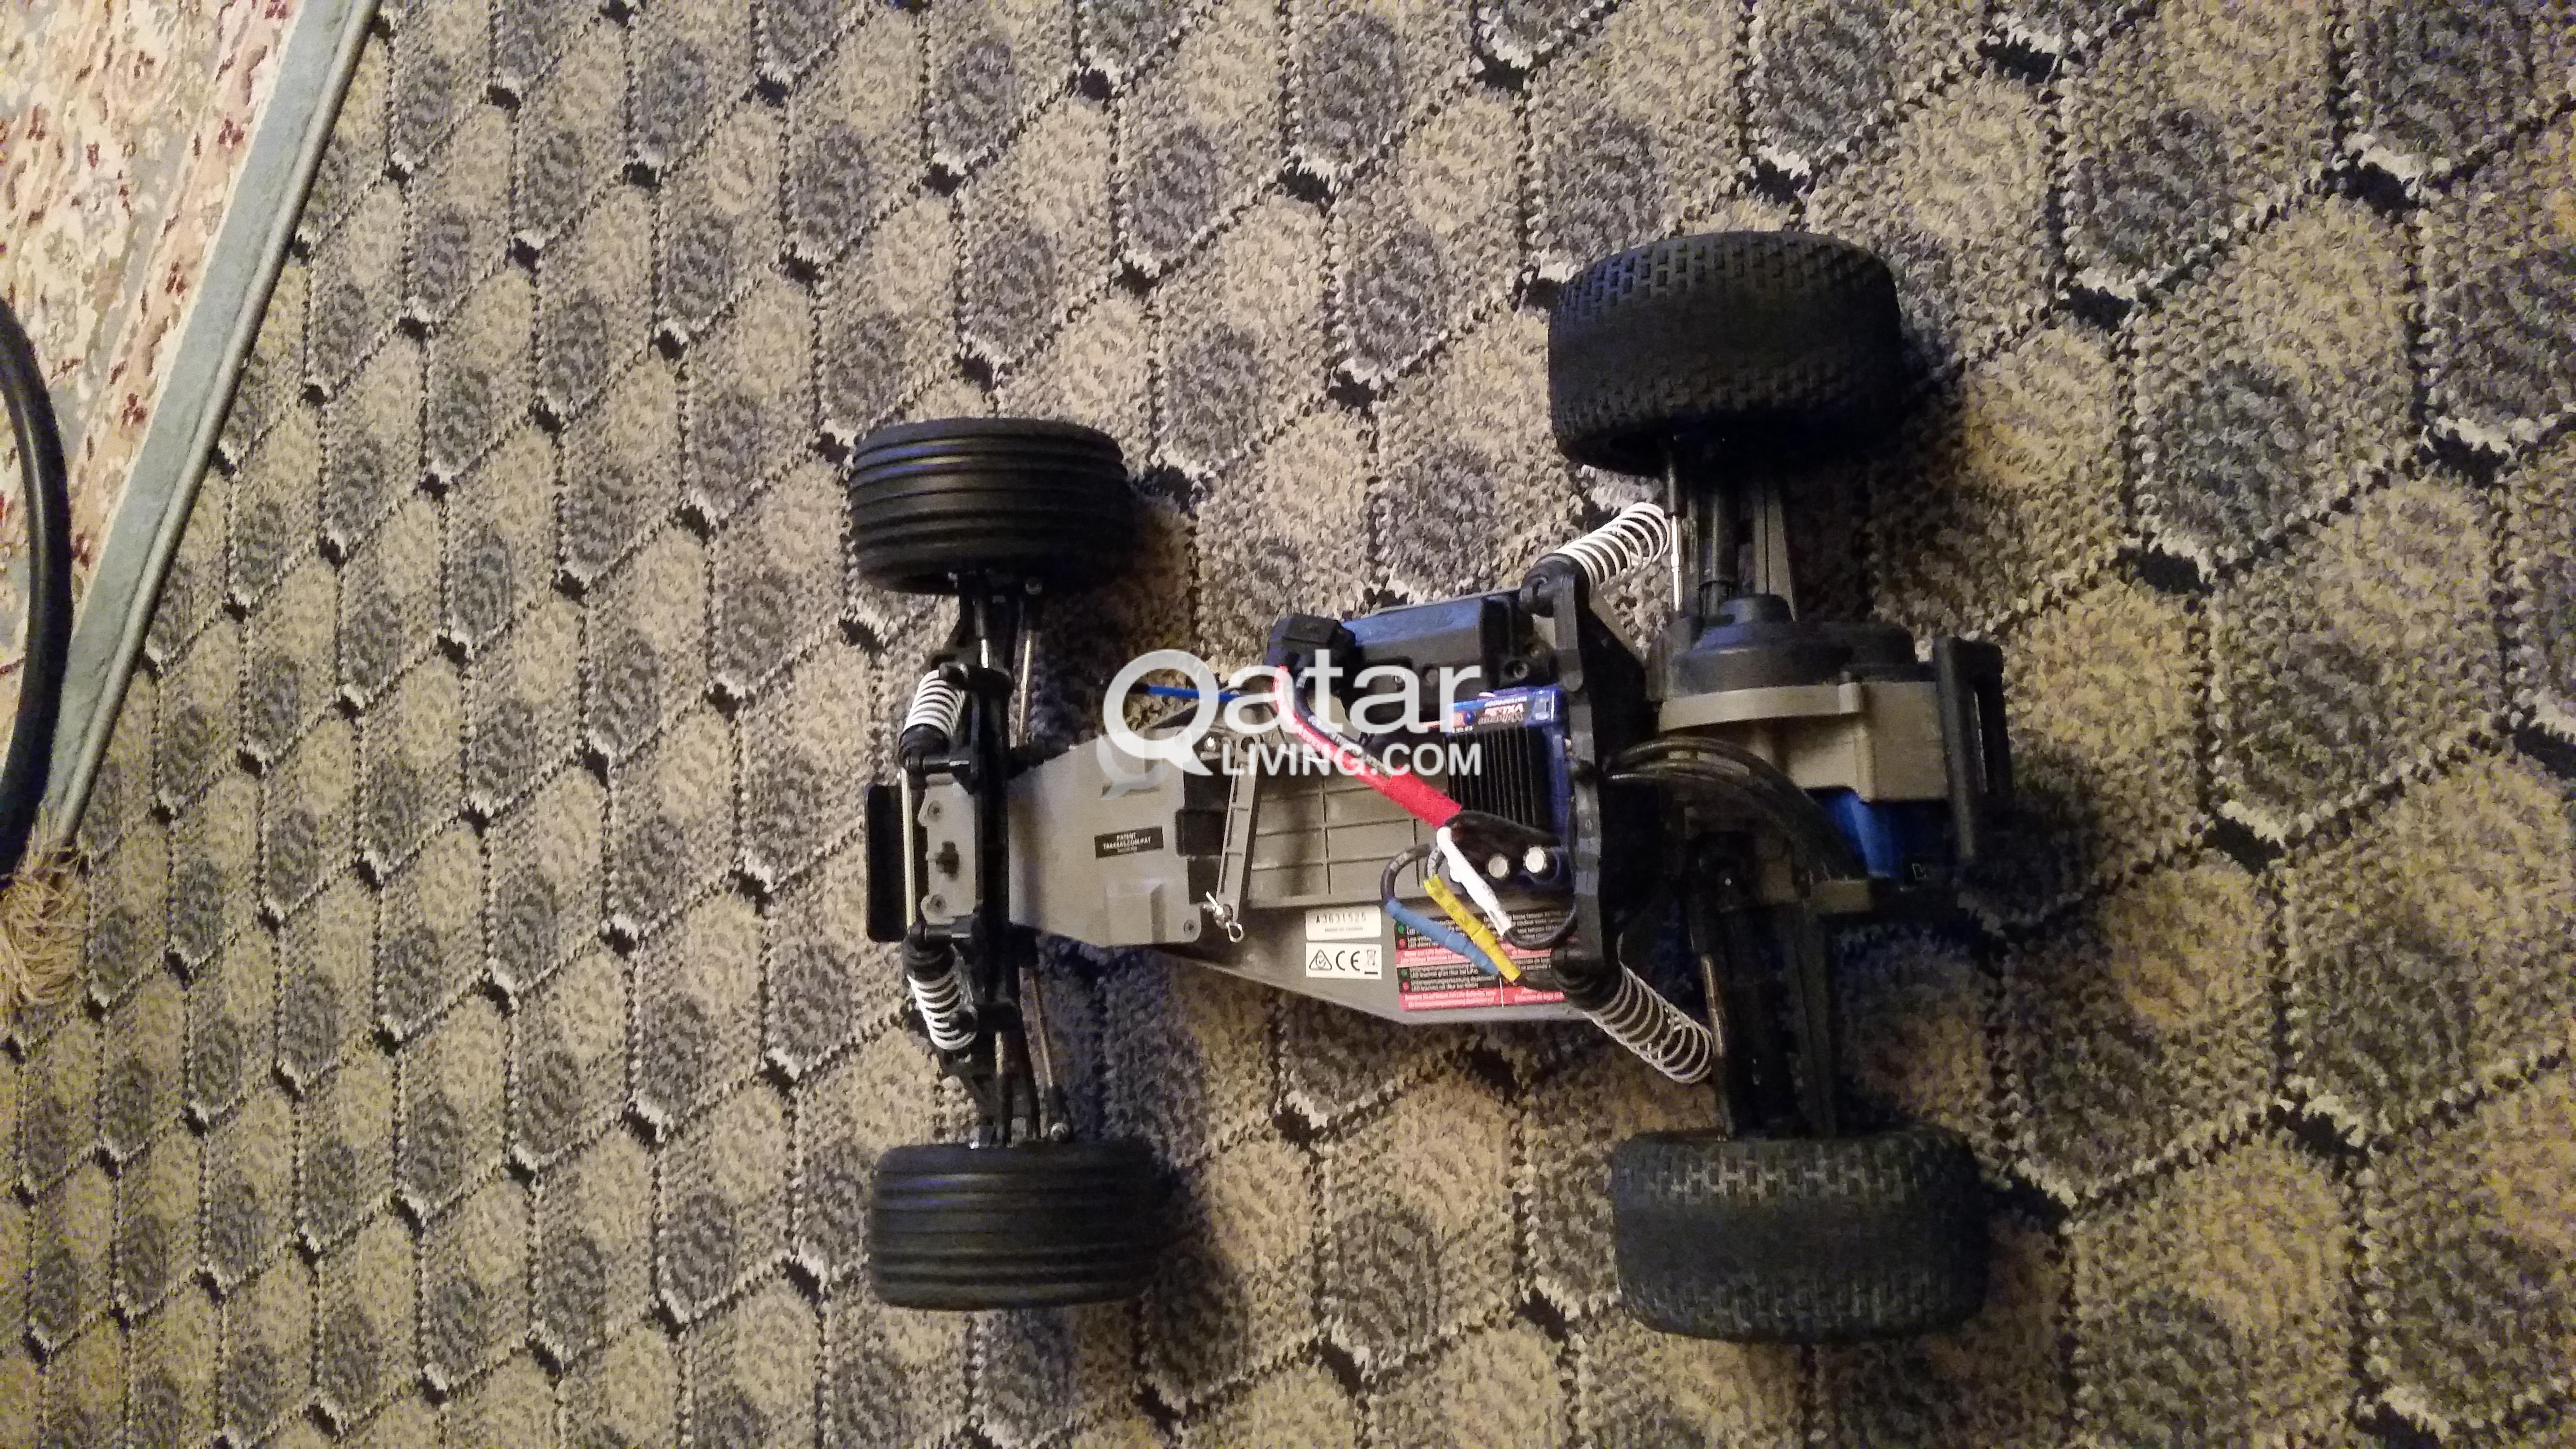 Traxxas Rustler Vxl S Brushless Edition Qatar Living Information